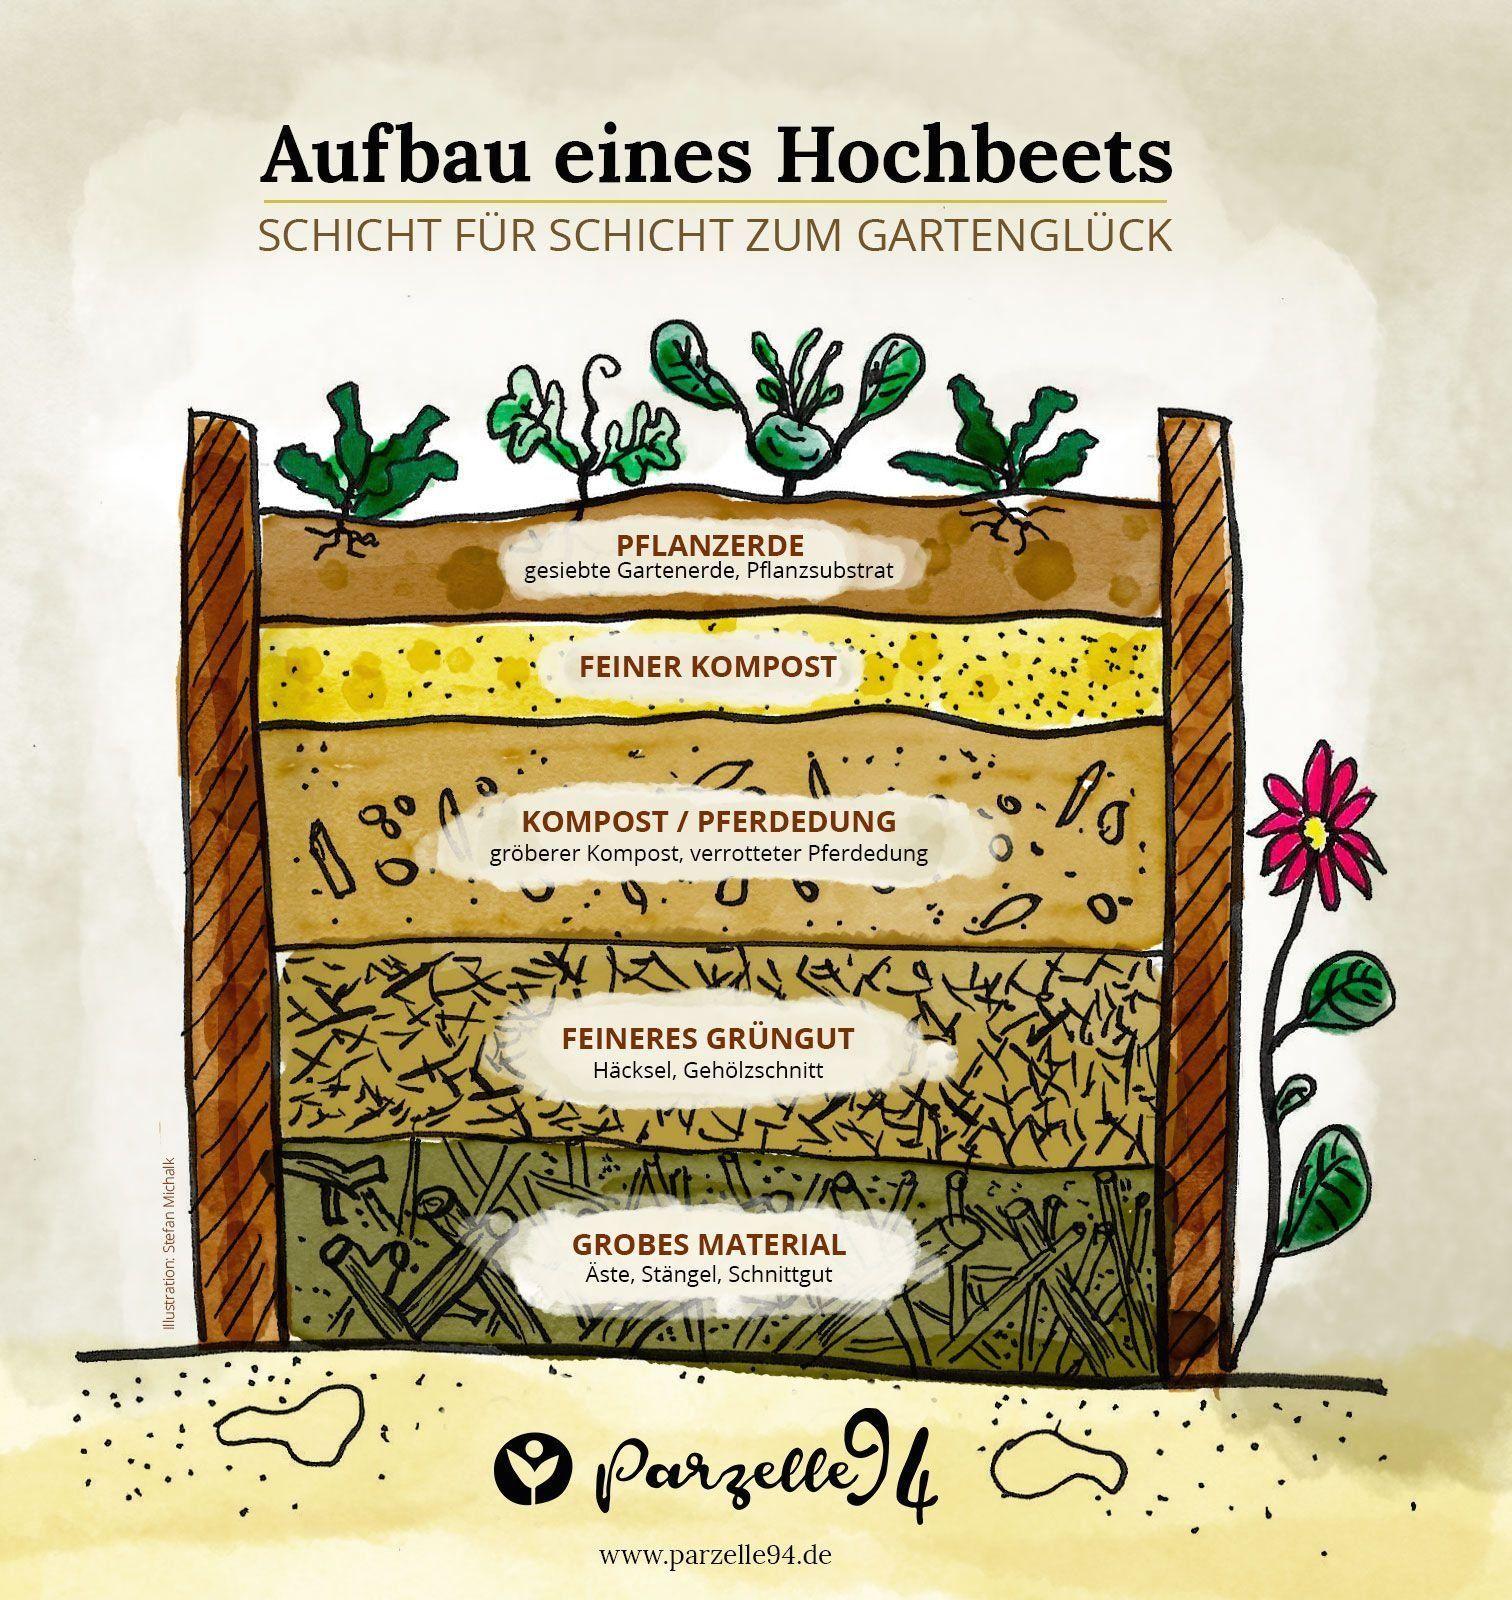 Hochbeet Wieder Befullen Anleitung Und Infografik Parzelle94 De Hoc 1000 In 2020 Diy Garden Bed Raised Garden Beds High Beds